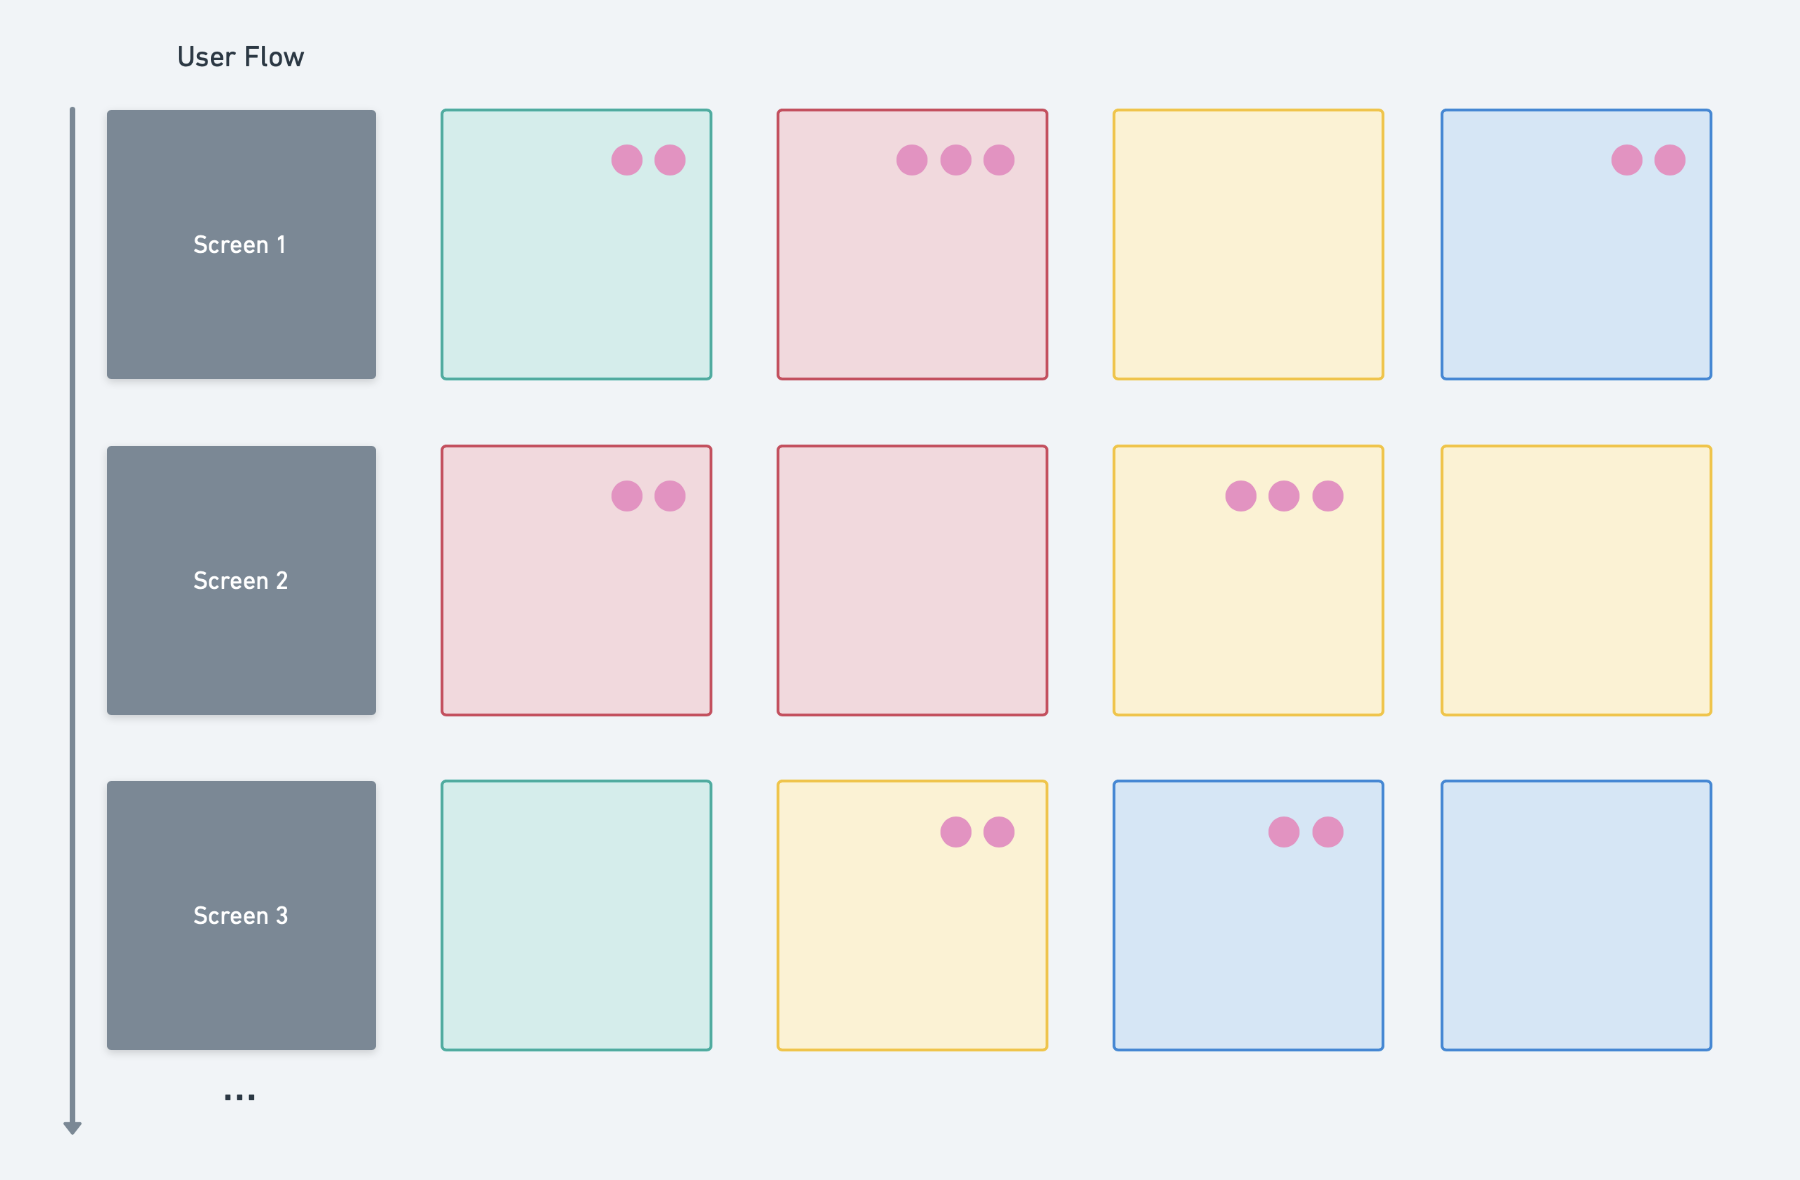 Merged boxes